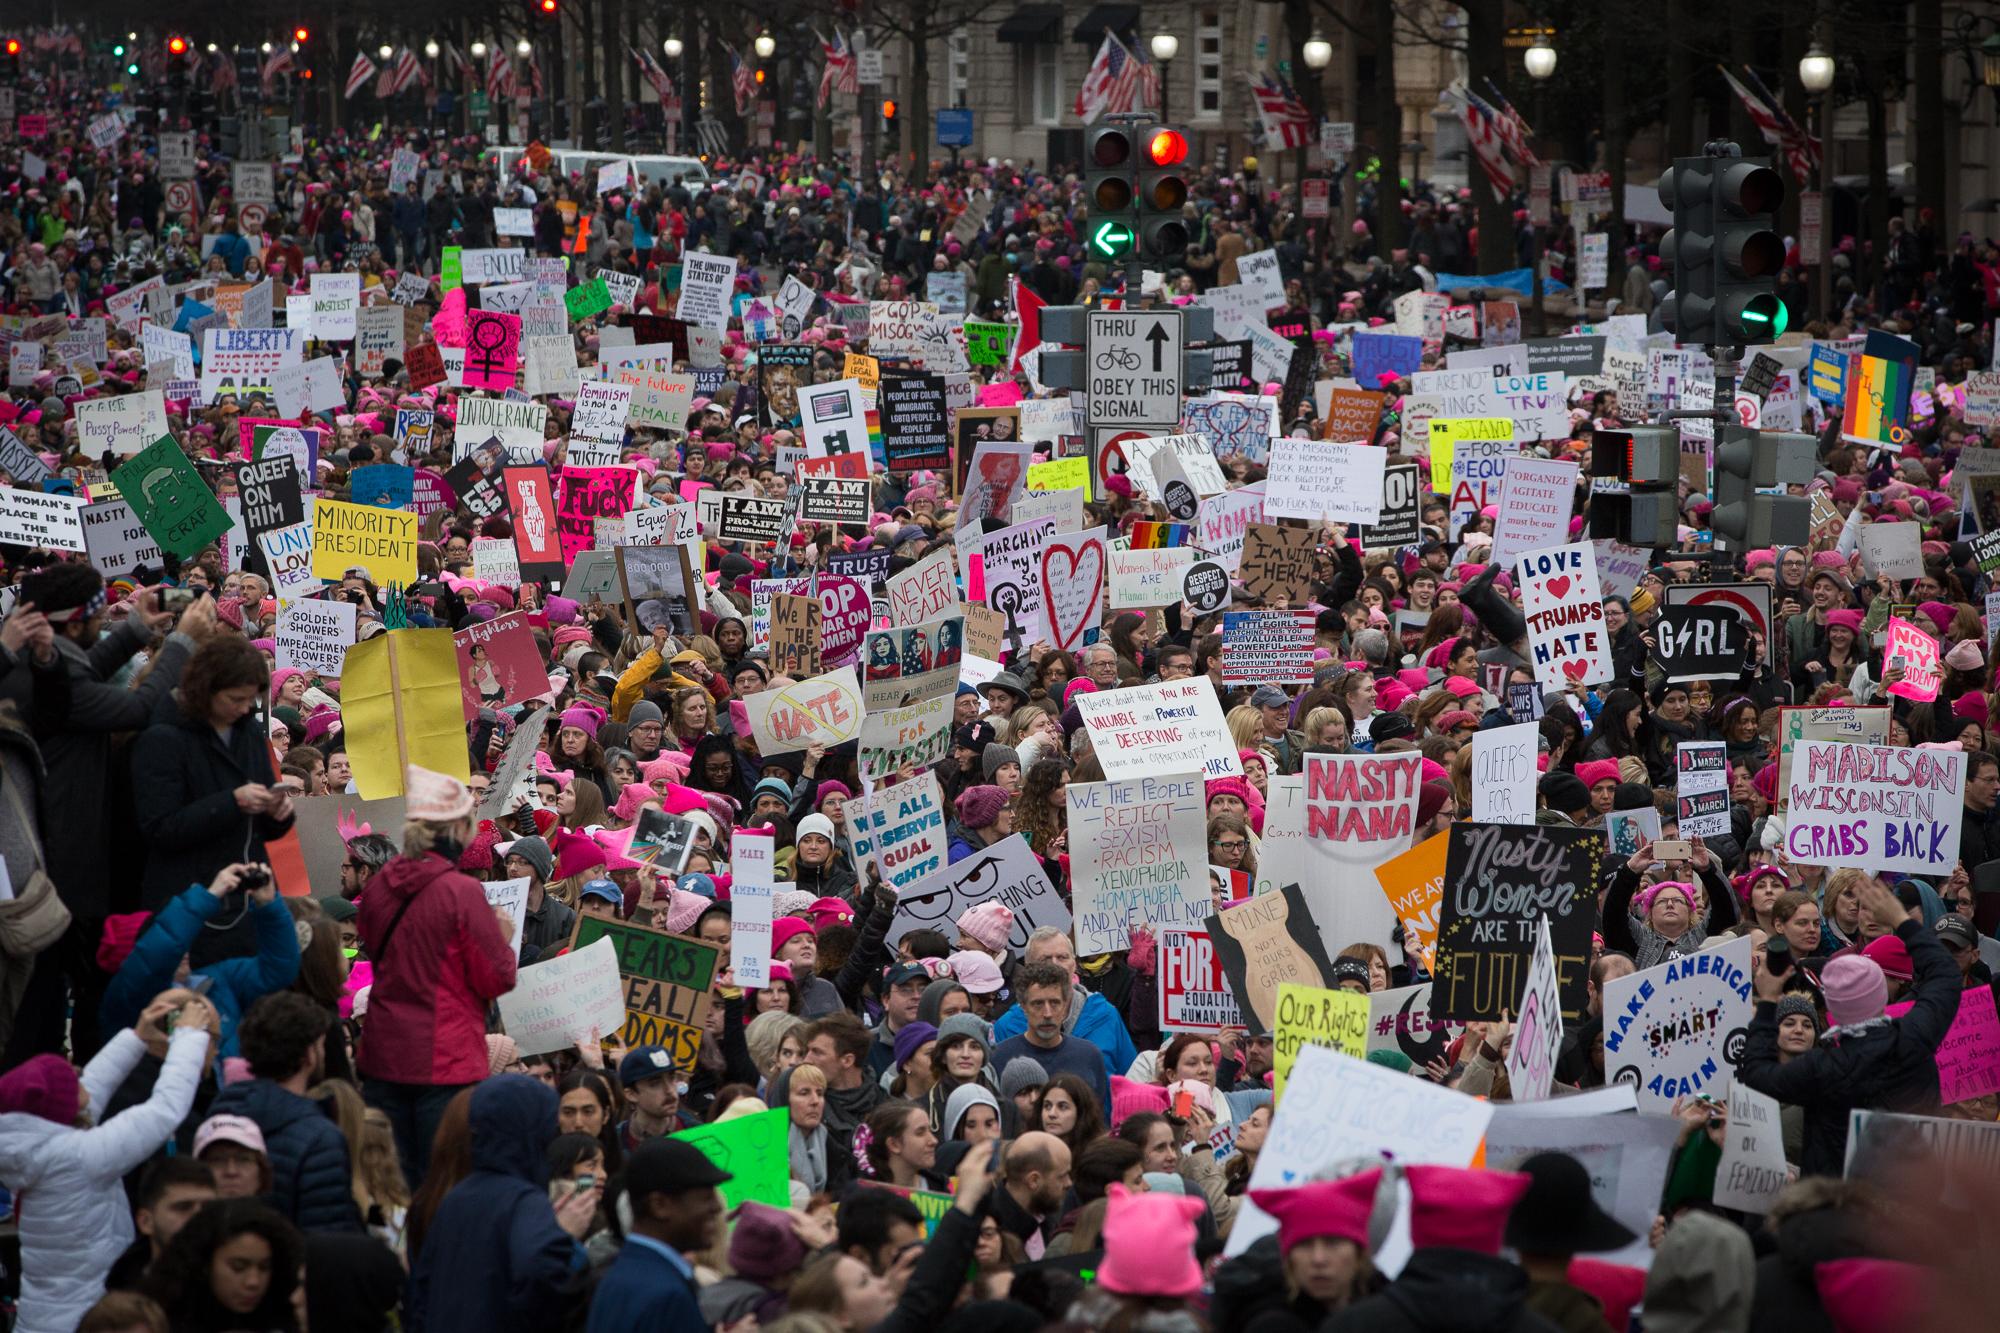 Women's March on Washington, Jan. 21, 2017.Photo Credit: Alex Arbuckle